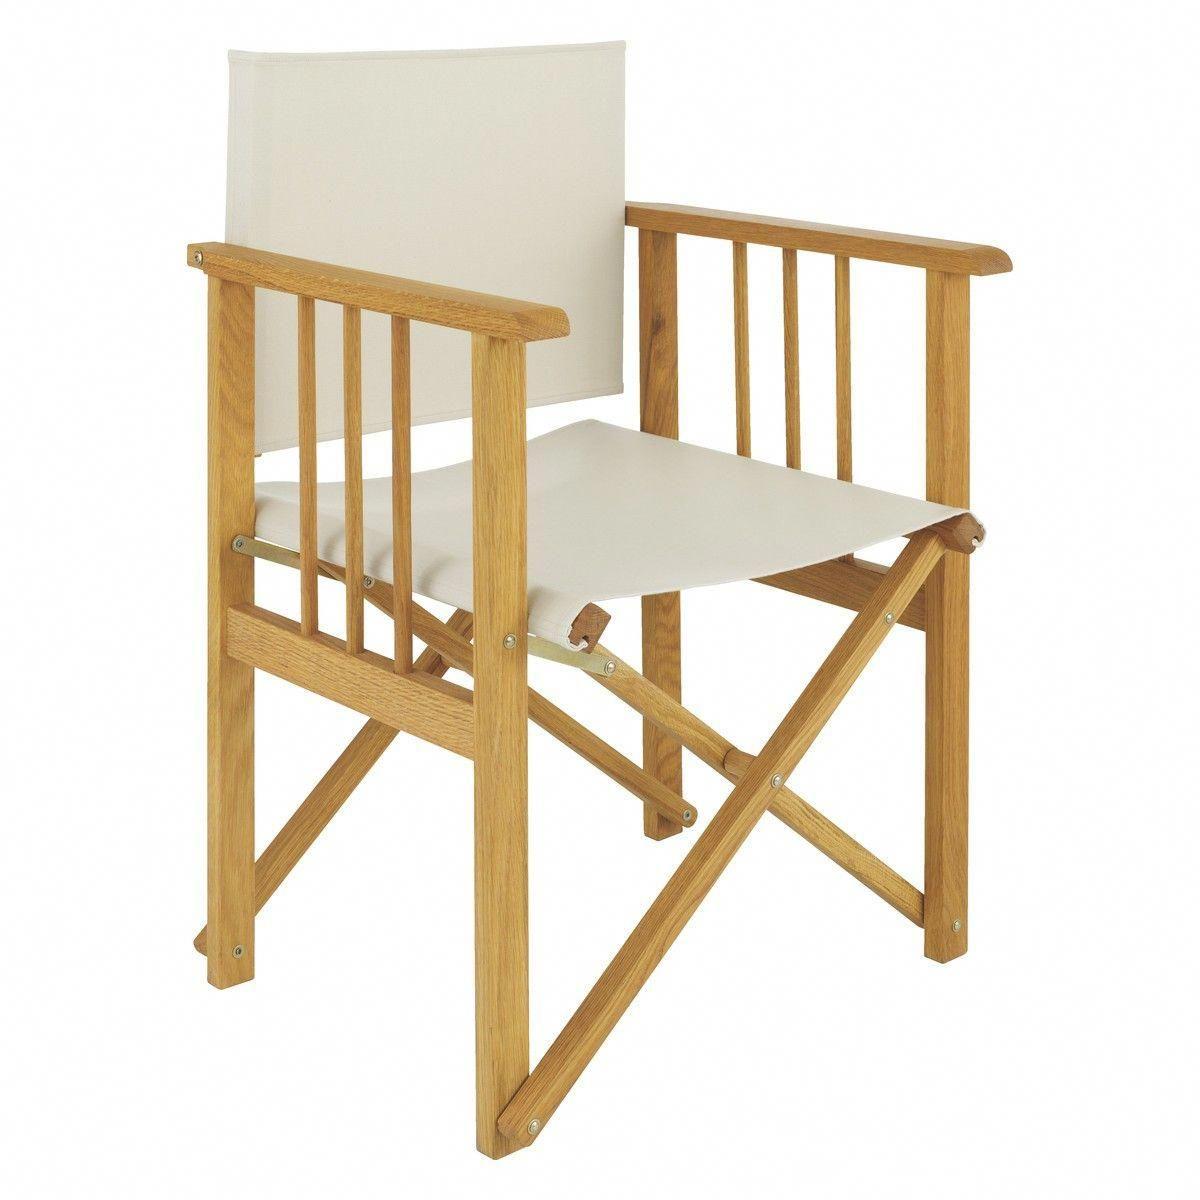 Director Chair Covers In Stores Beige Accent Target Africa Oak Directors Frame Mushroomchair Metal Outdoor